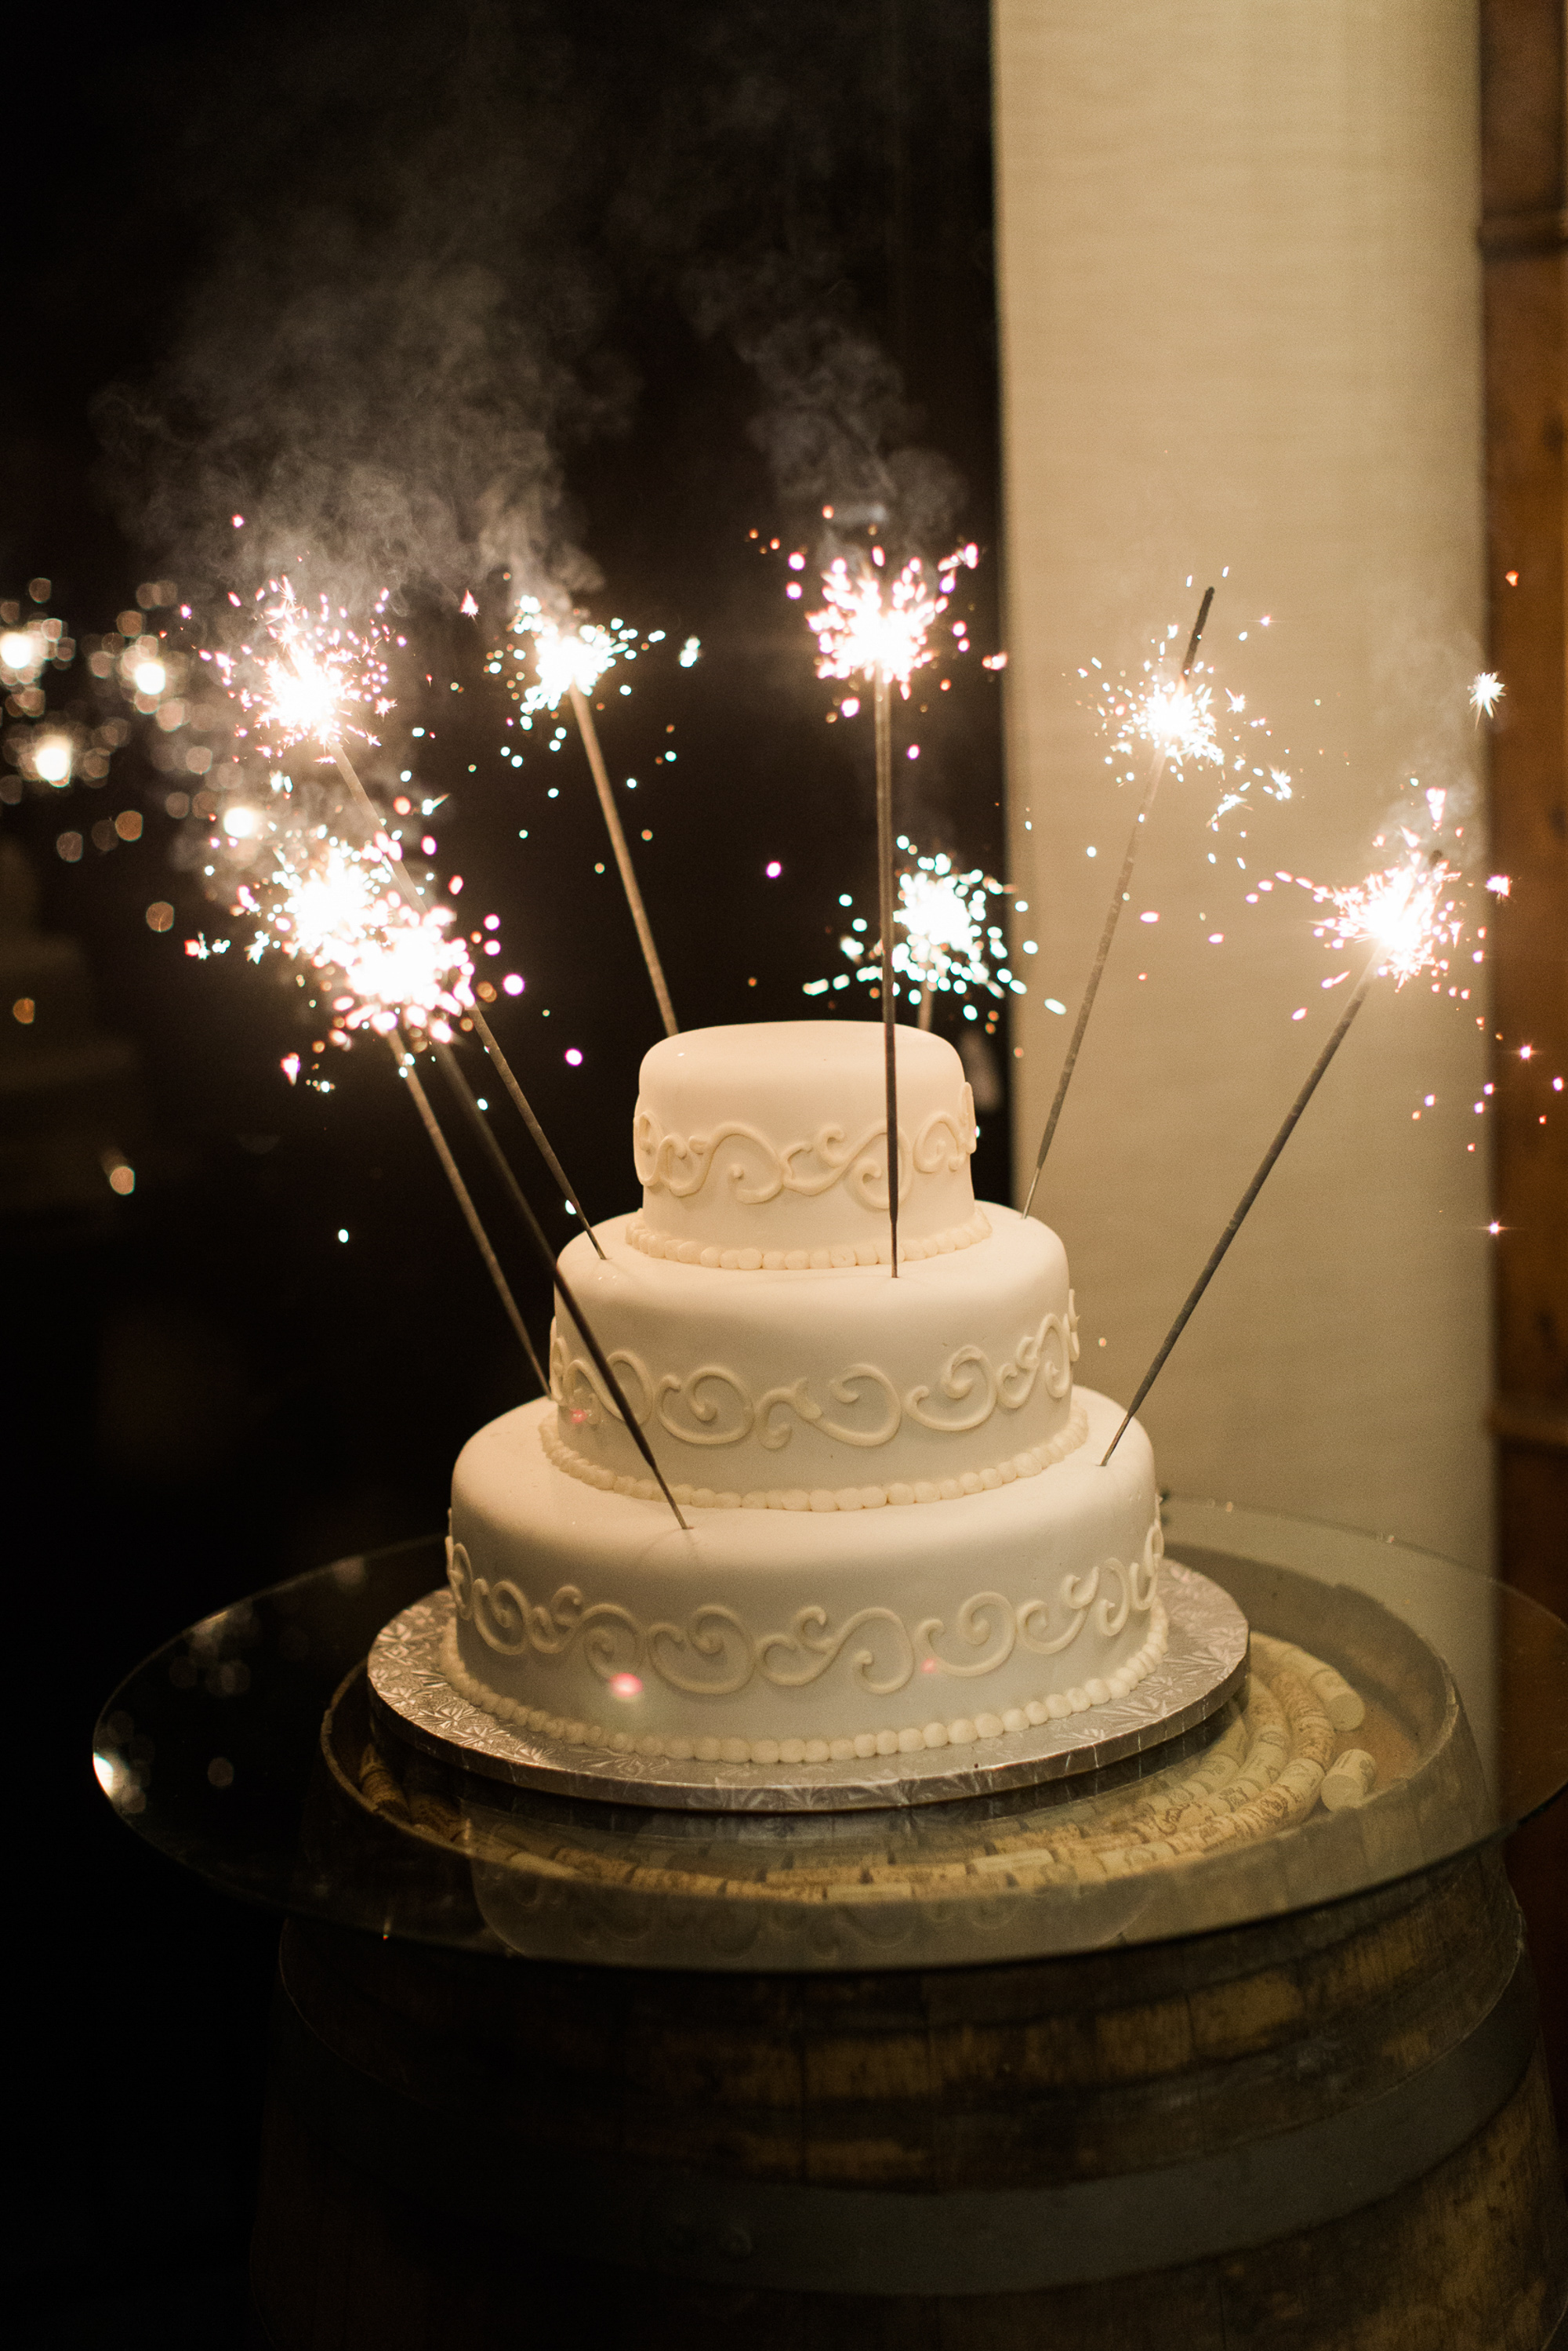 d0ba2-messina-hof-wedding-56messina-hof-wedding-56.jpg